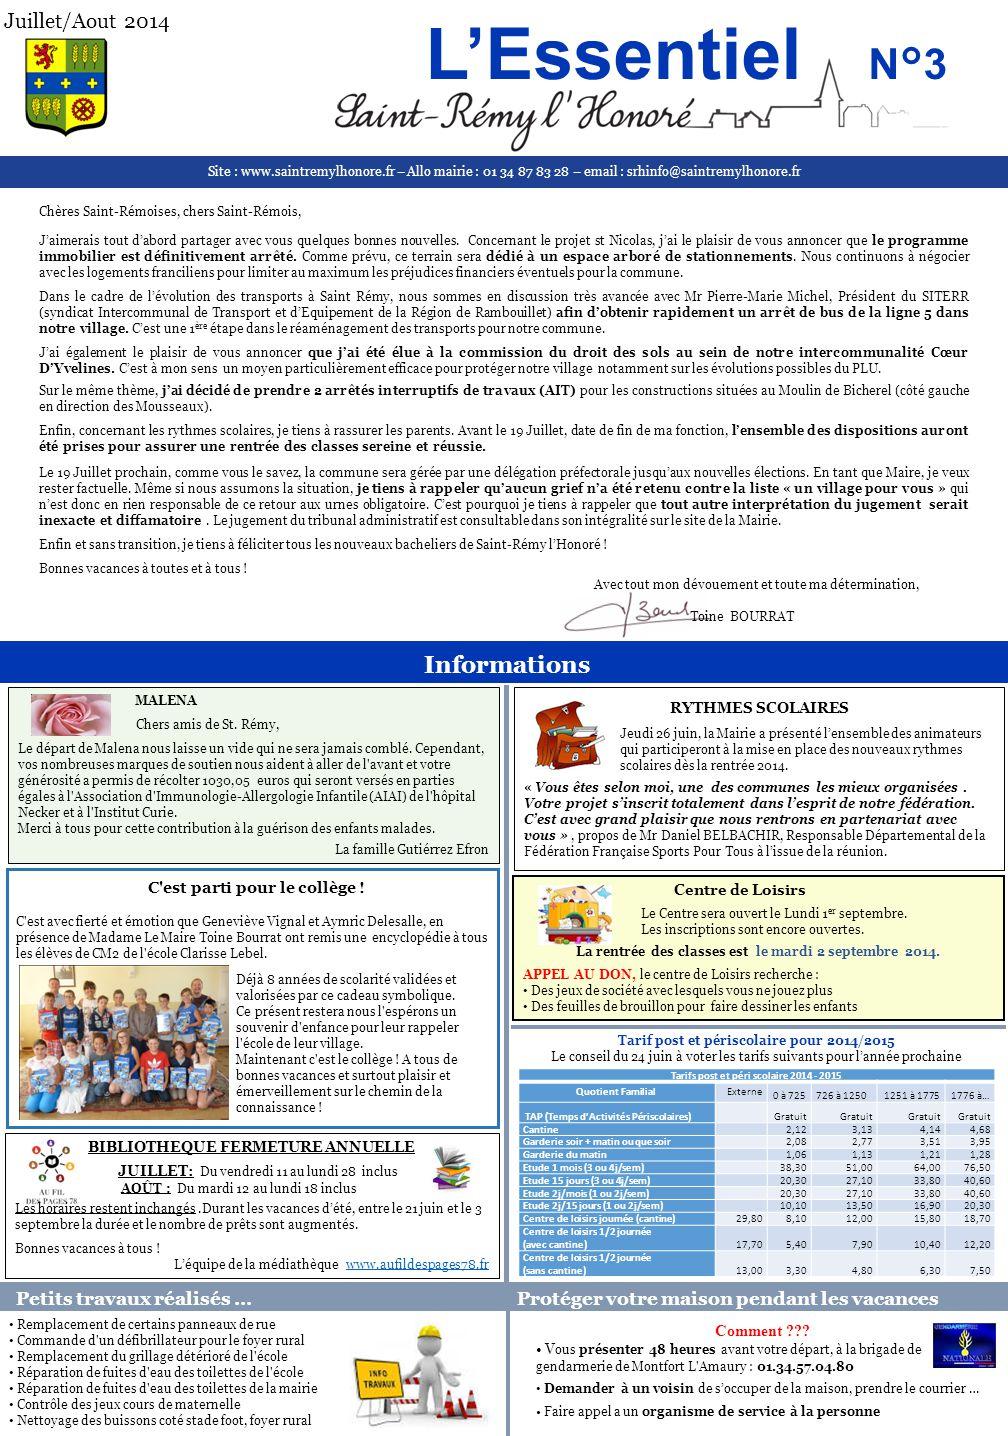 Juillet/Aout 2014 L'Essentiel N°3. Site : www.saintremylhonore.fr – Allo mairie : 01 34 87 83 28 – email : srhinfo@saintremylhonore.fr.